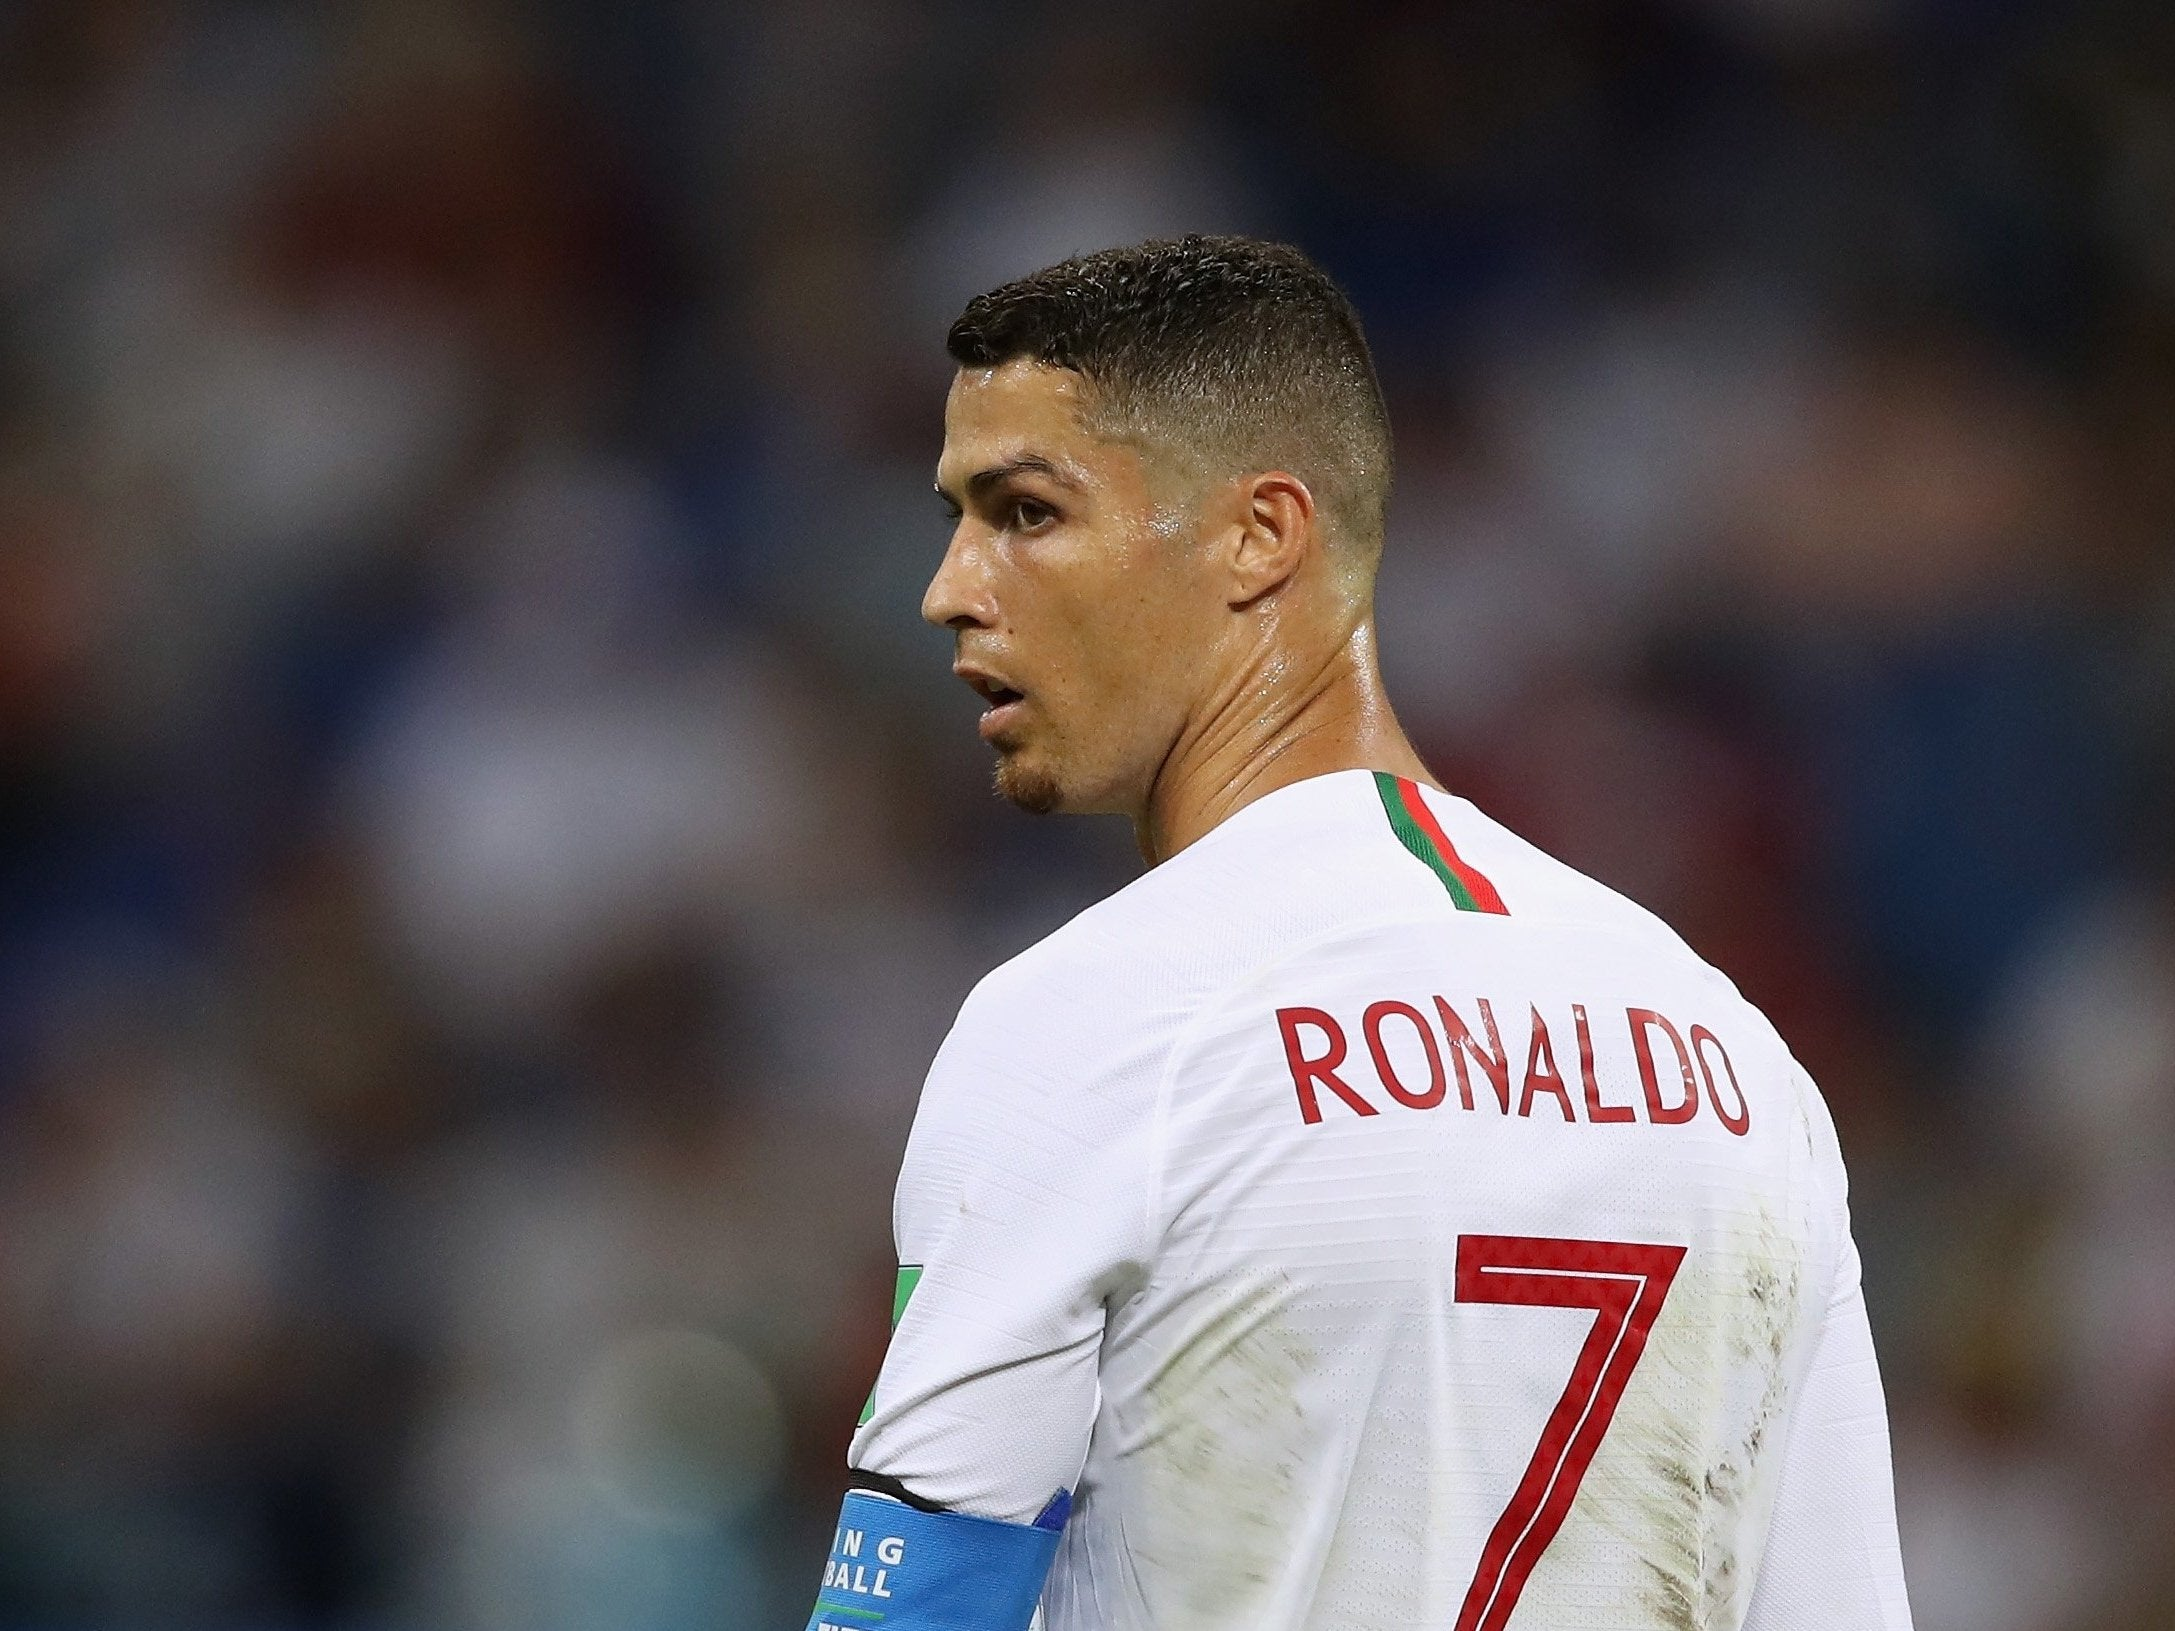 china brazils forward ronaldo - 1024×694